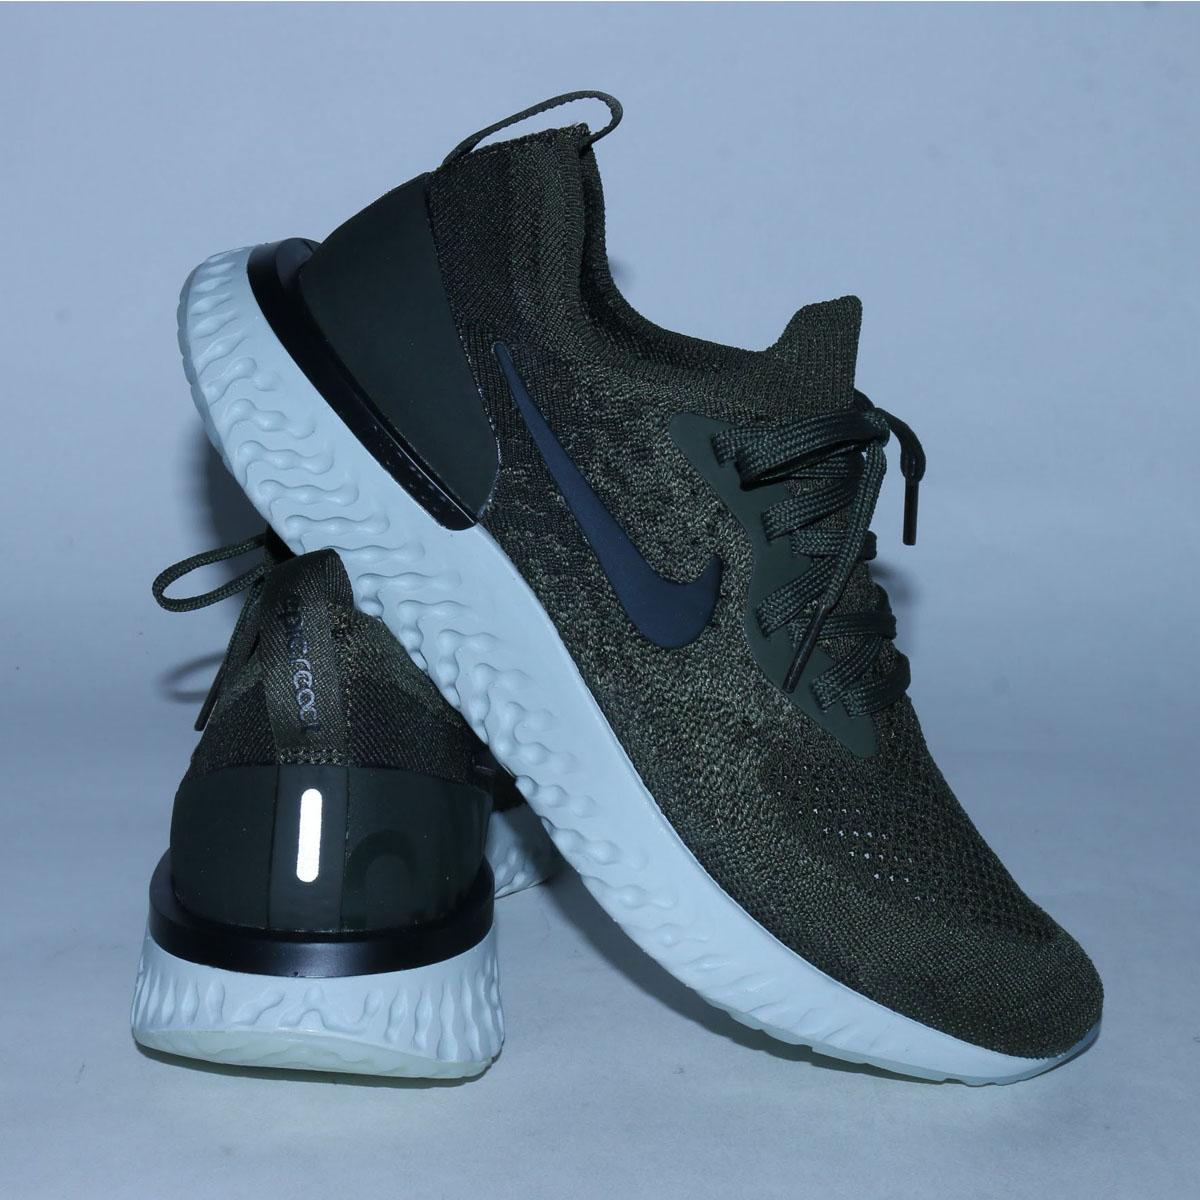 b98a107748b7 NIKE WMNS EPIC REACT FLYKNIT (Nike women epic re-act fly knit) (CARGO KHAKI  BLACK-SEQUOIA-LIGHT SILVER) 18SU-S